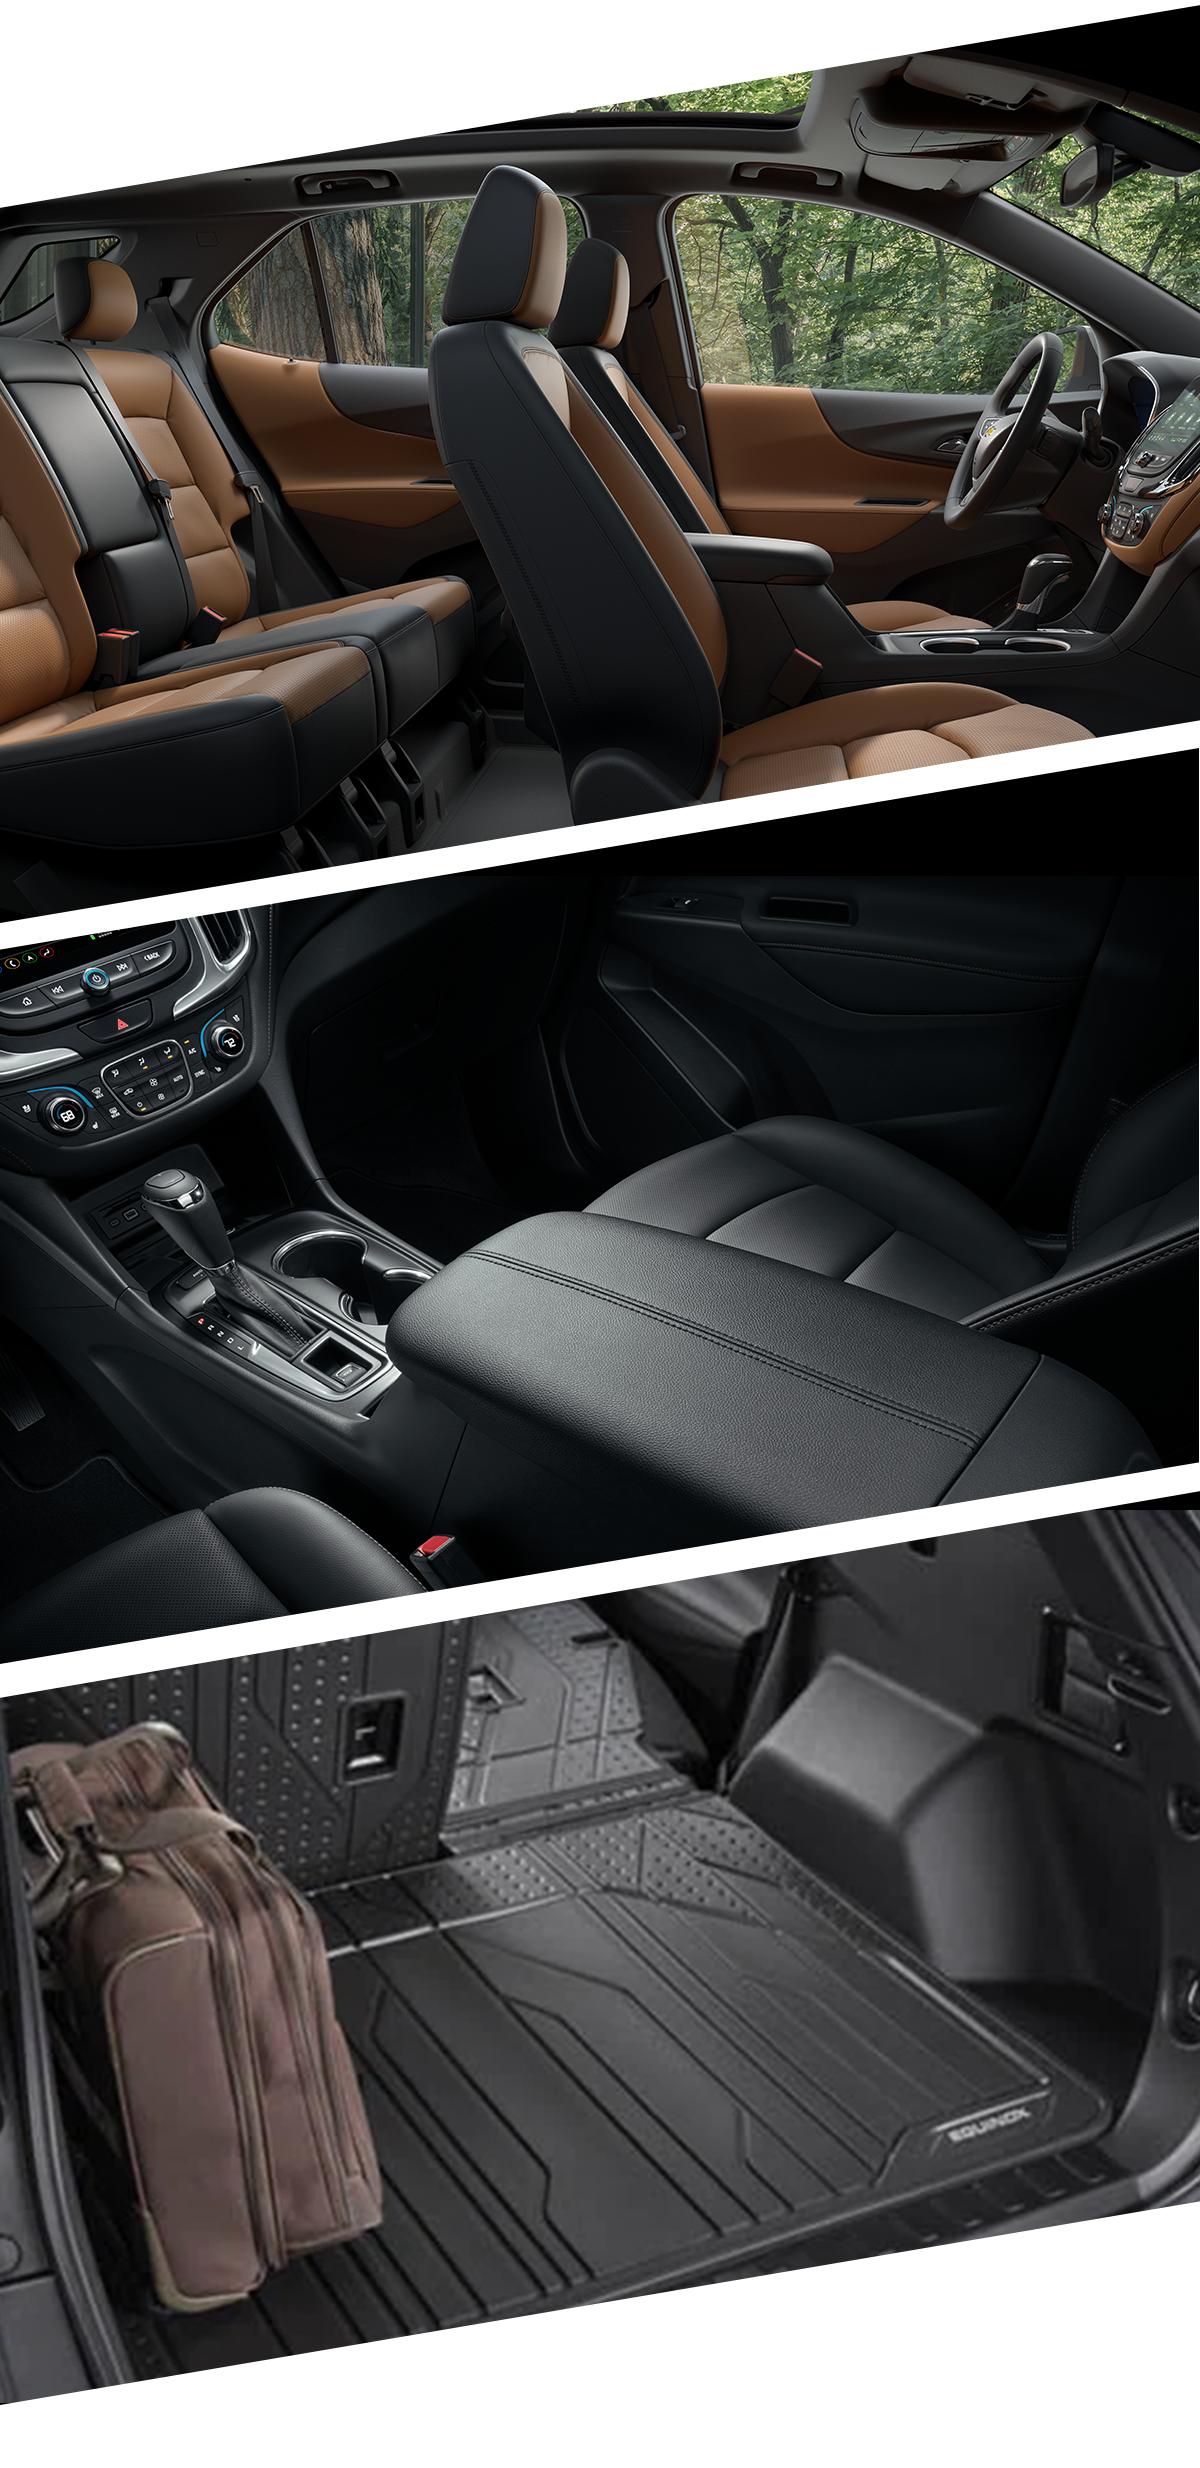 2021 Chevrolet Equinox Interior Images in Roanoke, VA